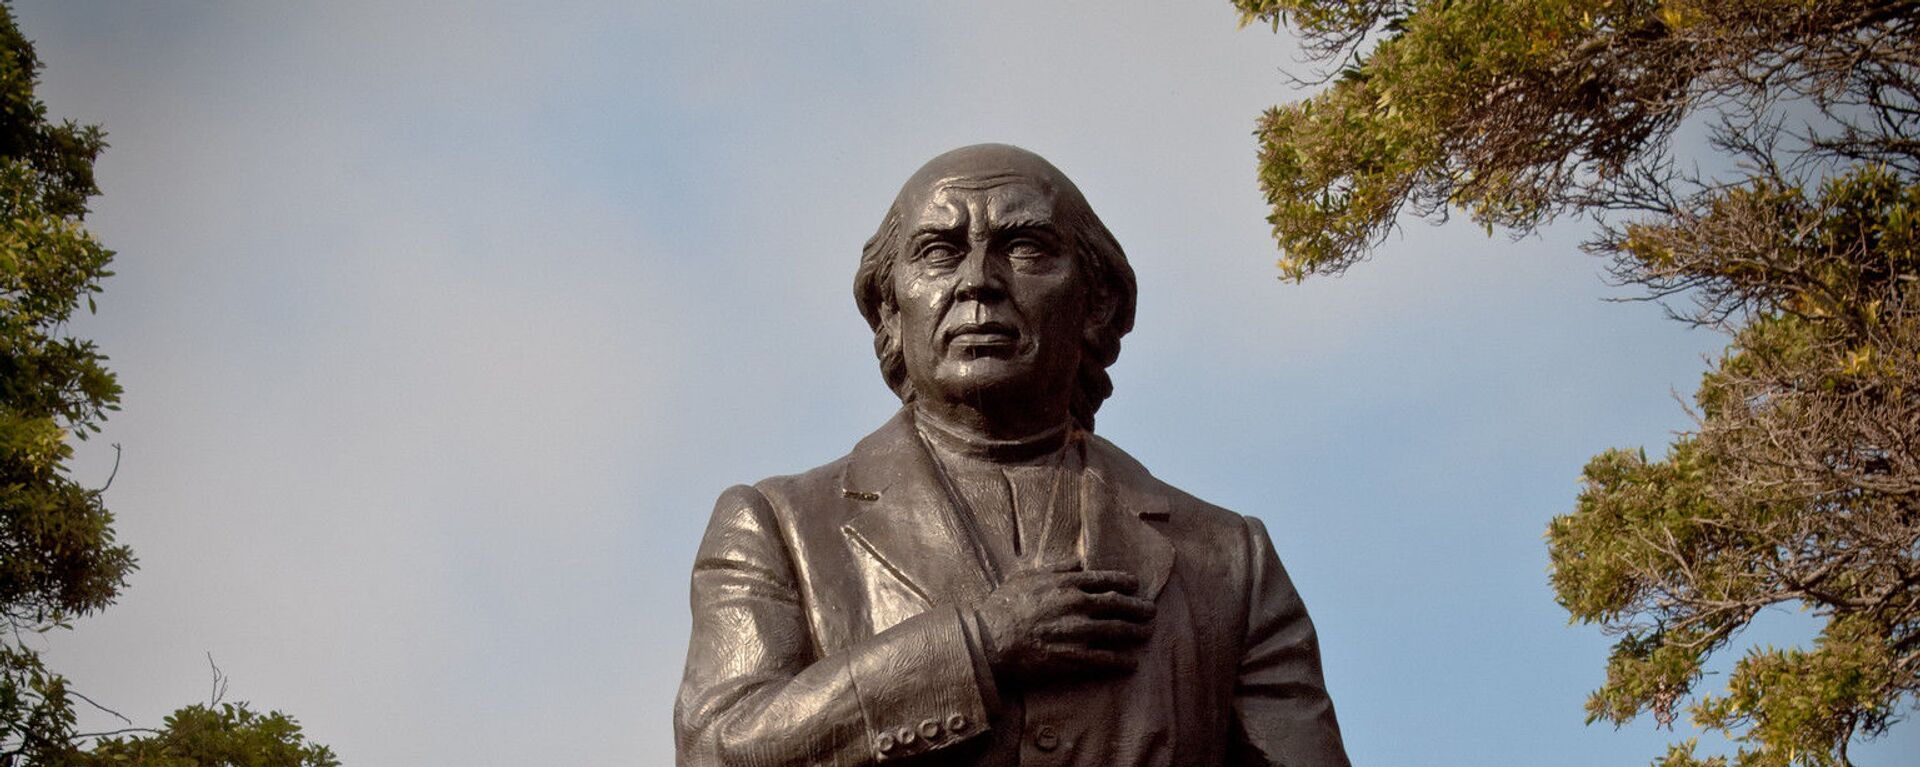 Monumento a Miguel Hidalgo - Sputnik Mundo, 1920, 15.09.2021